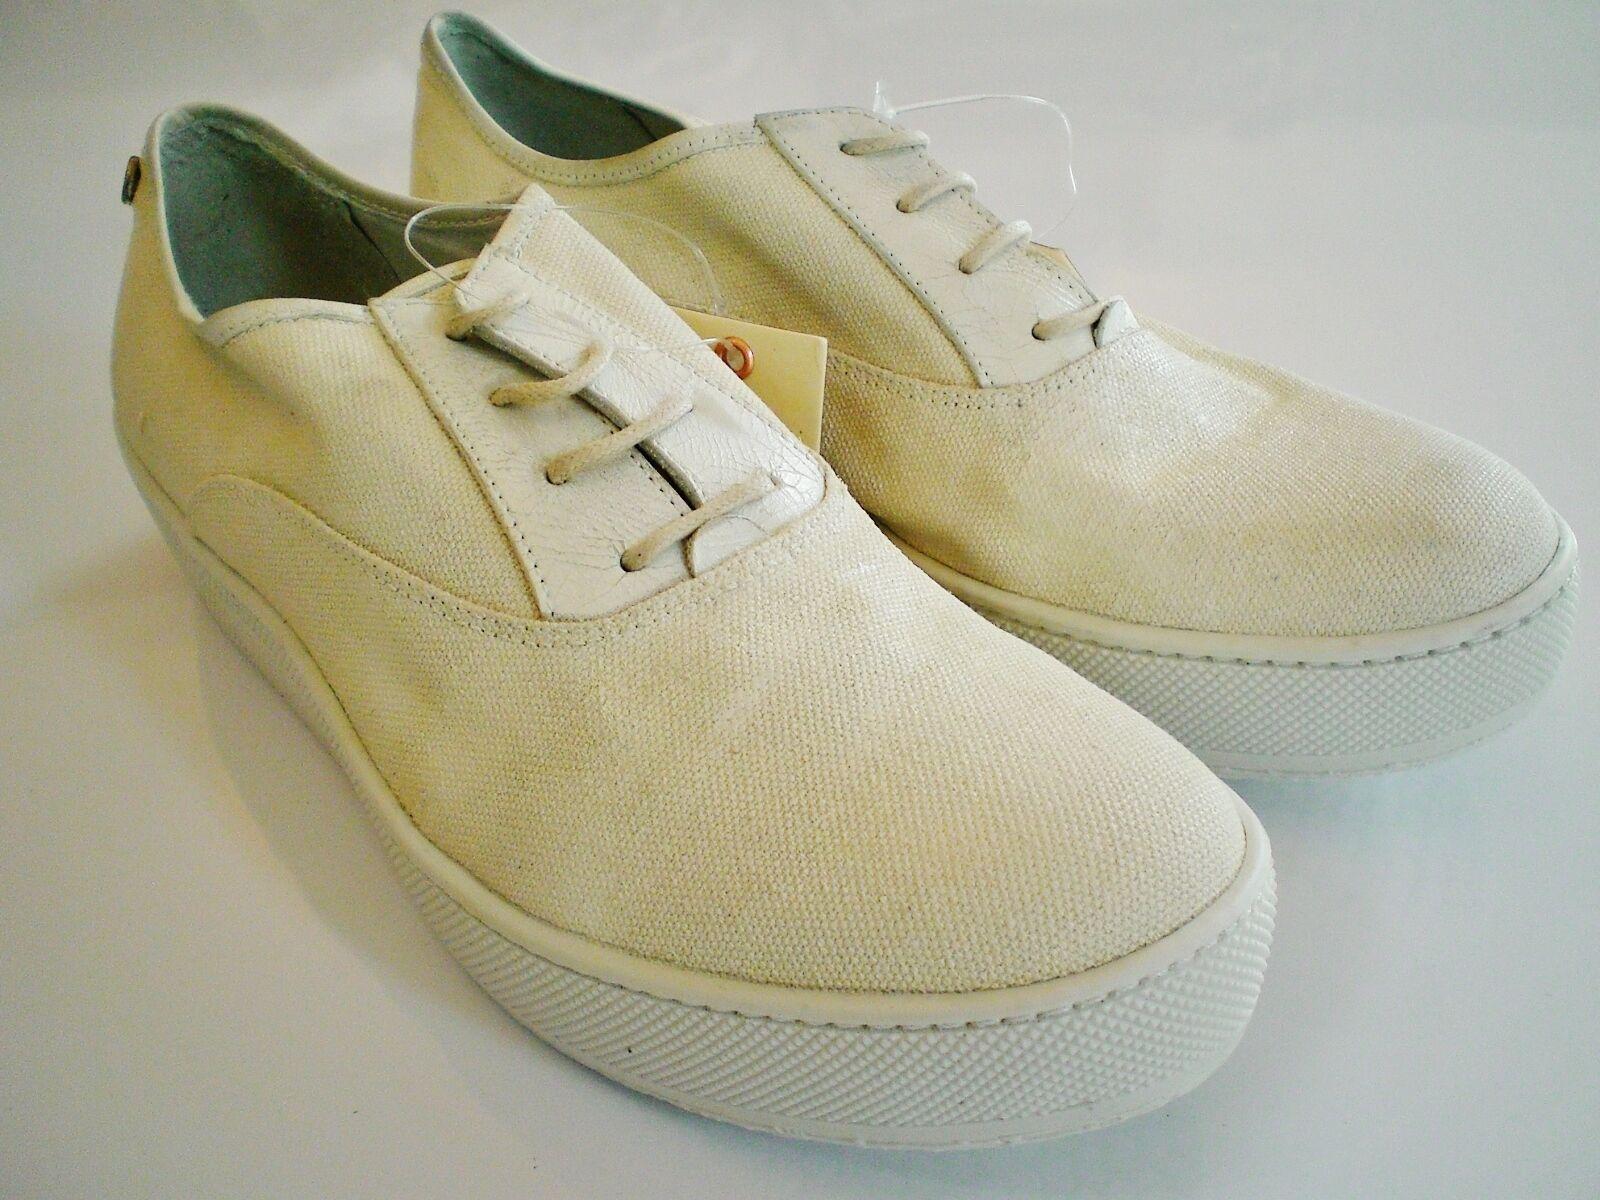 Original DIESEL Damenschuhe BOXUP NALITAH W Gr. 39 Canvas Plateau Sneaker NEU